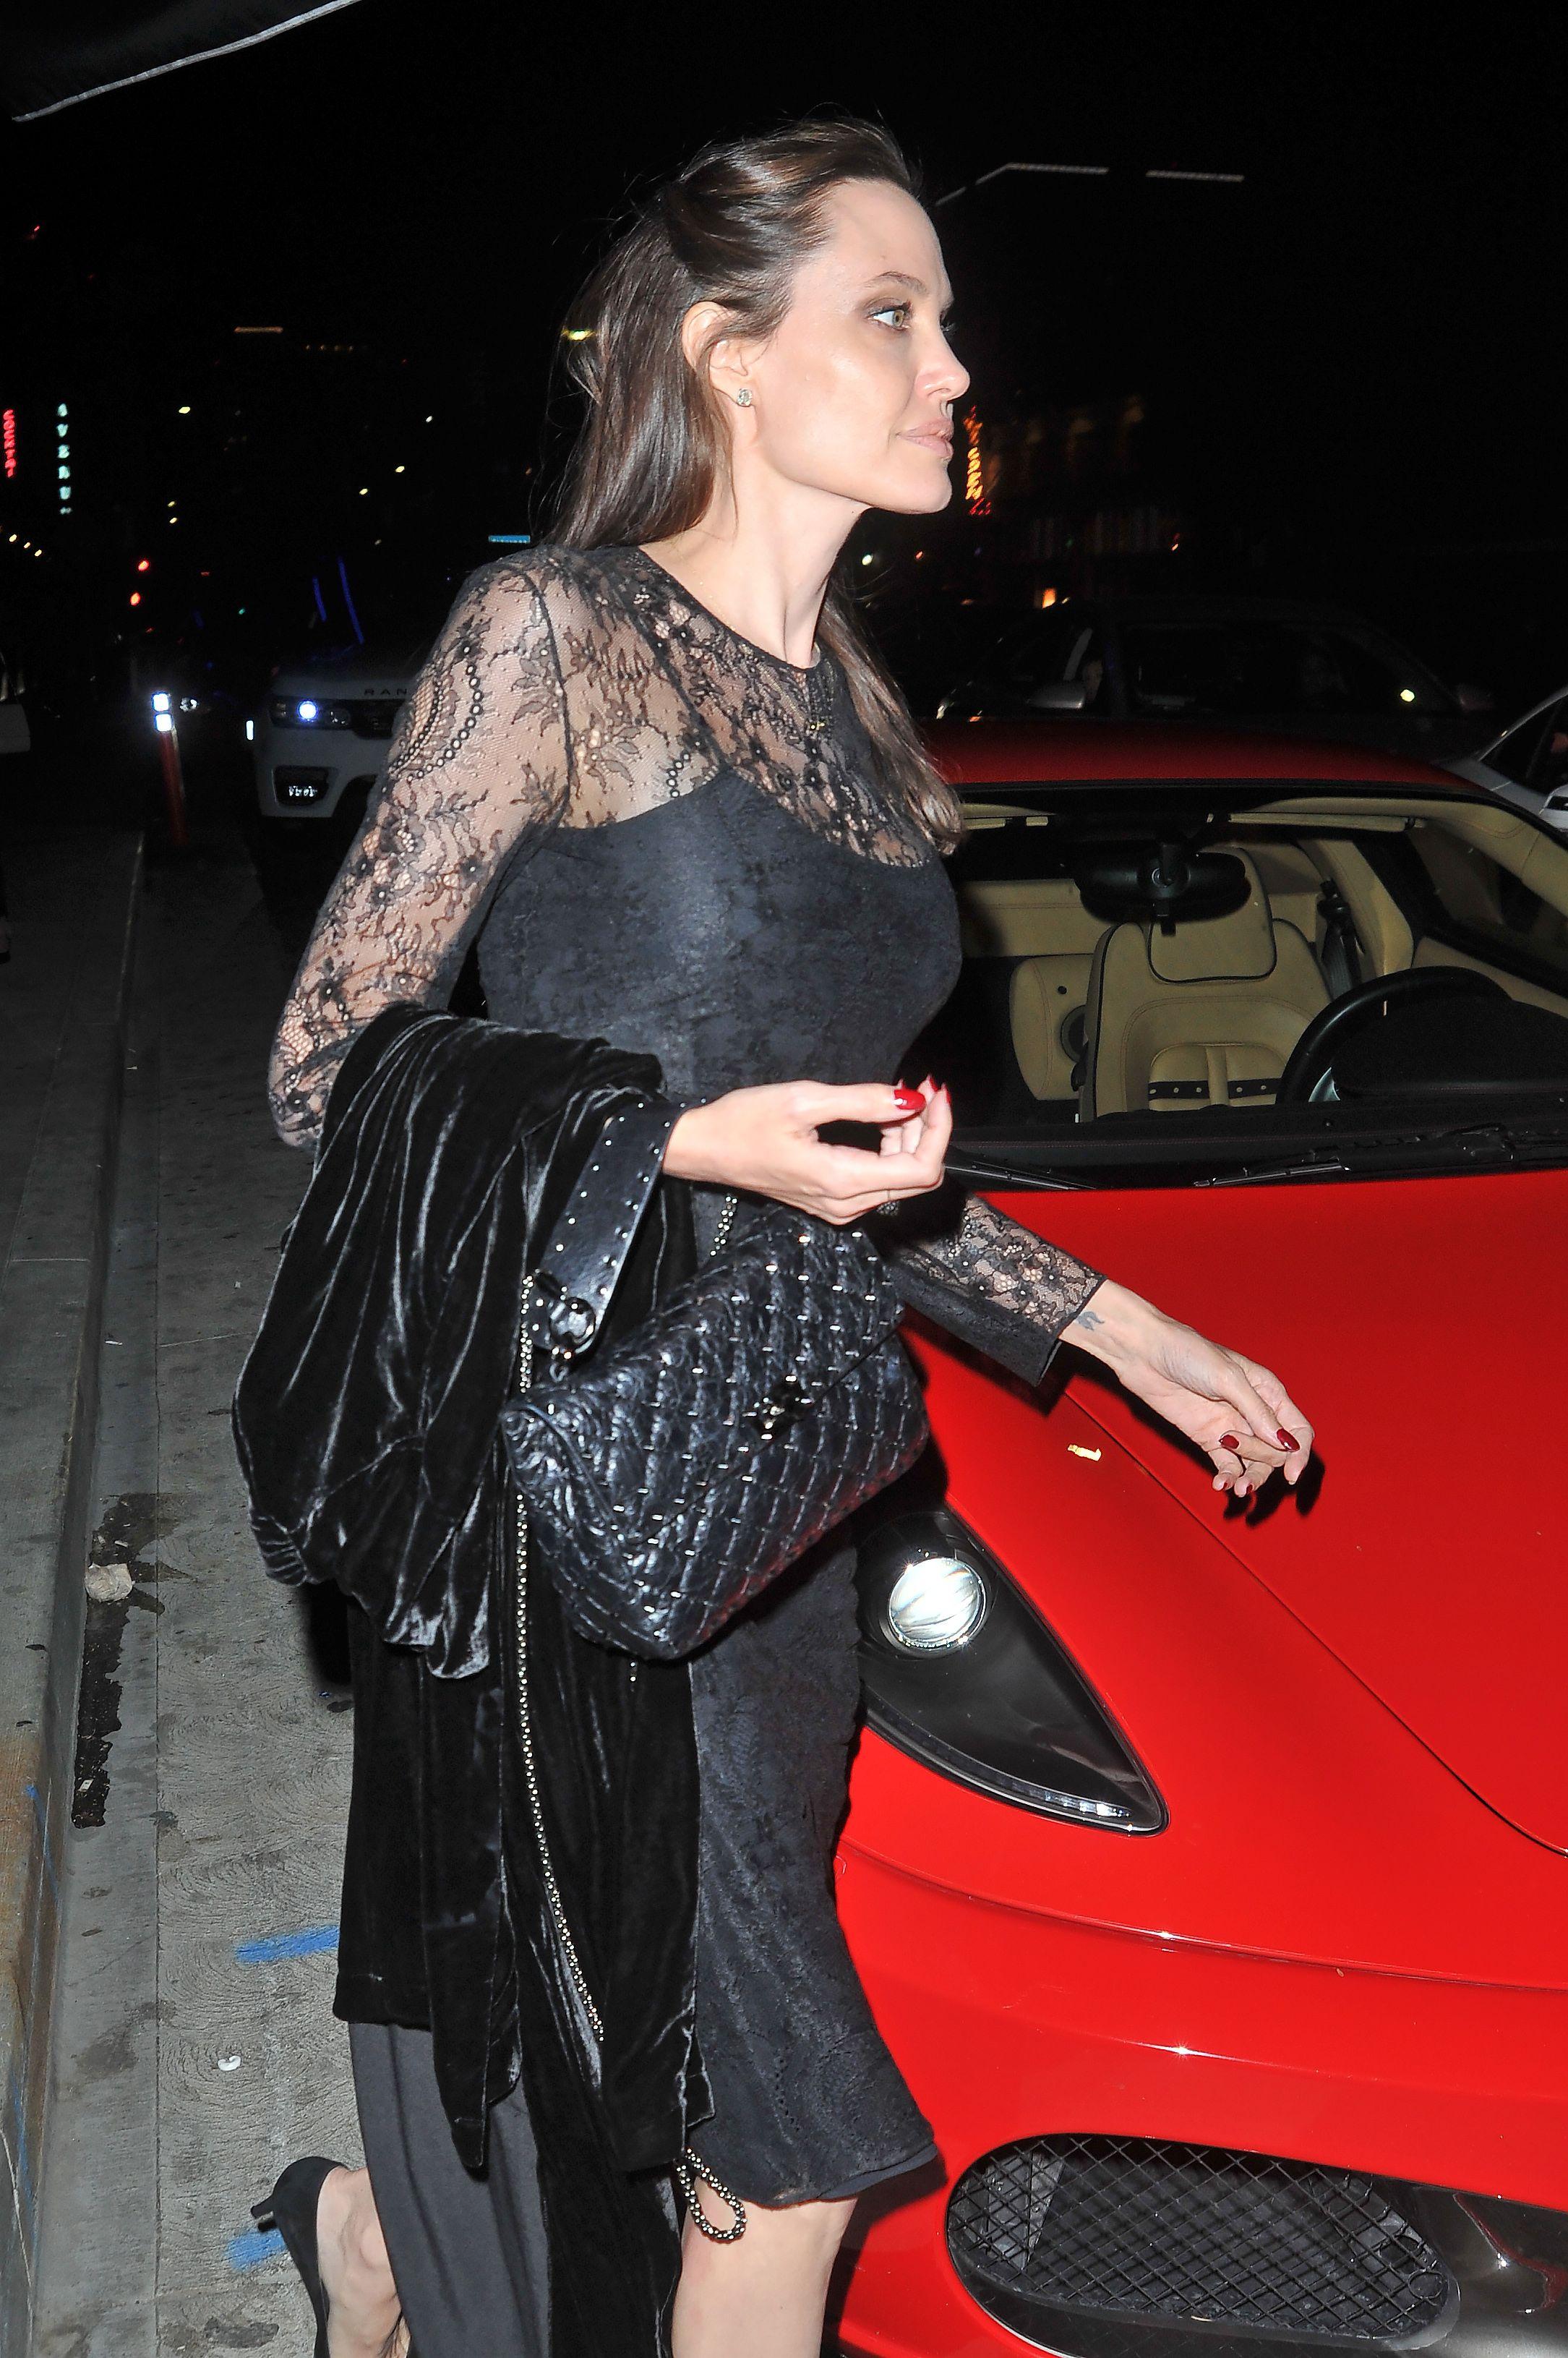 c5f89c2767a Bag goals! The iconic  AngelinaJolie captured in LA wearing the it  accessory of the season  Valentino Garavani Rockstud Spike in a dark shade.